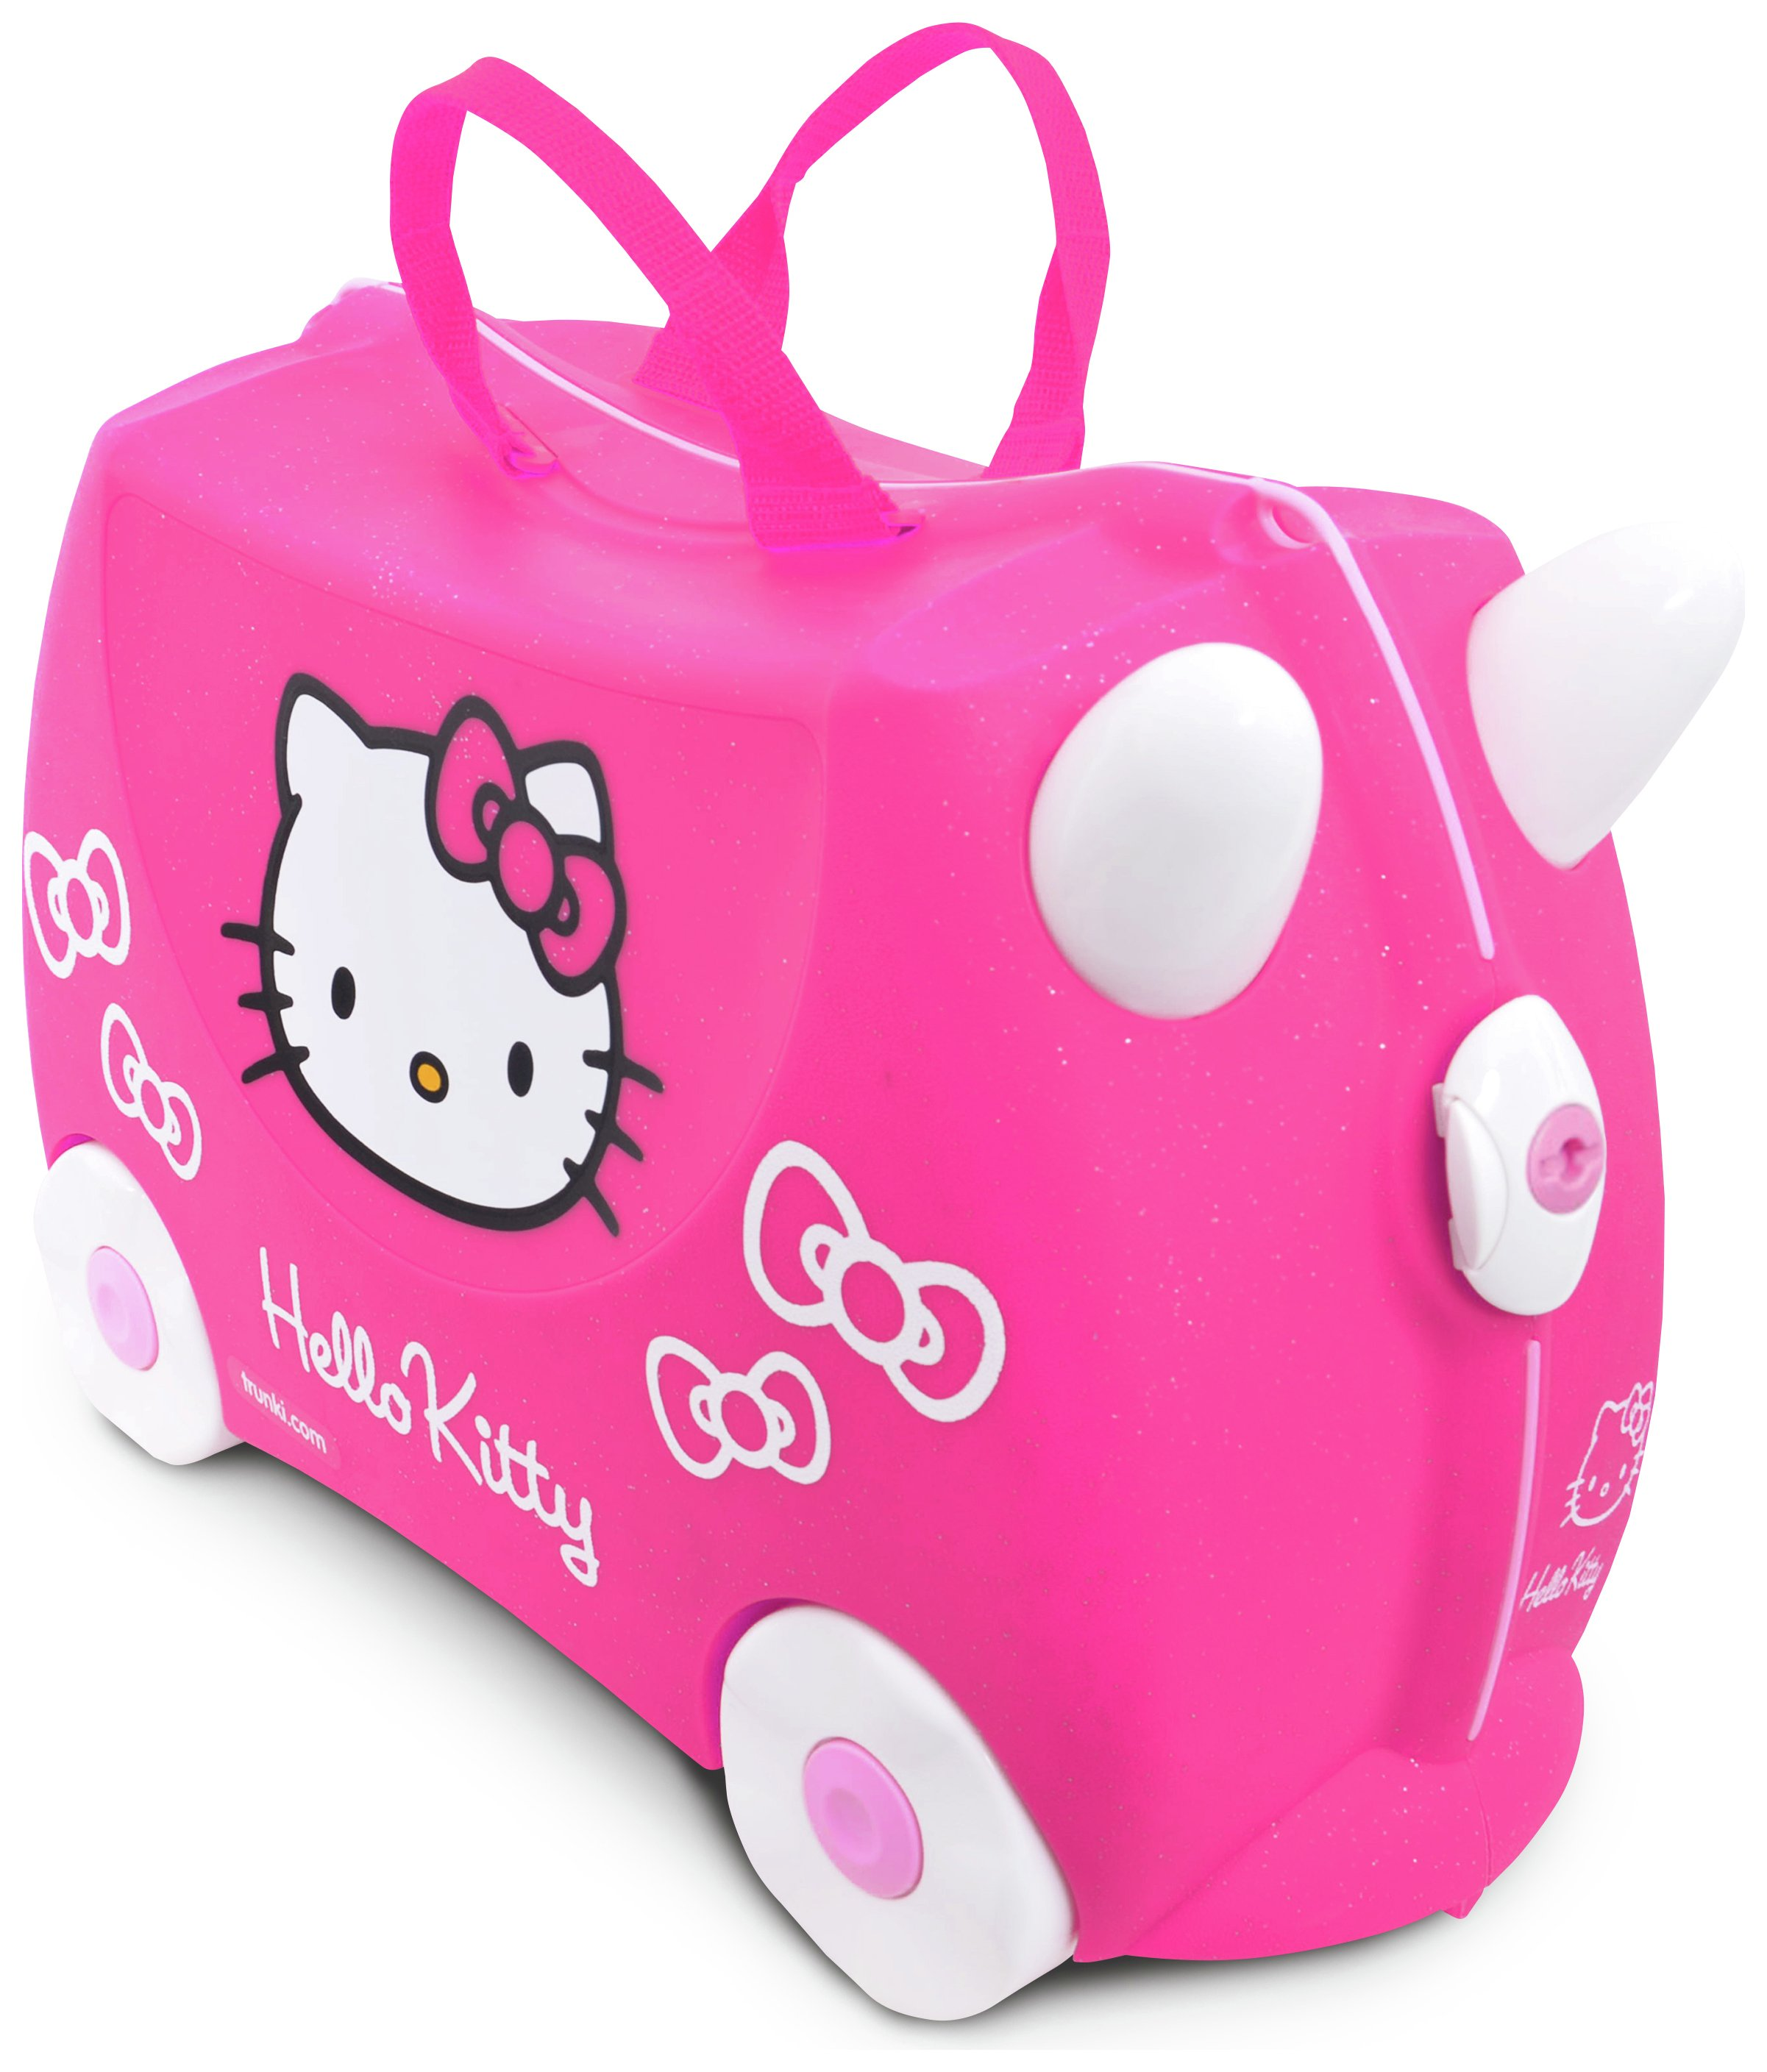 Buy Trunki Hello Kitty Ride-On Suitcase - Pink at Argos.co.uk ...